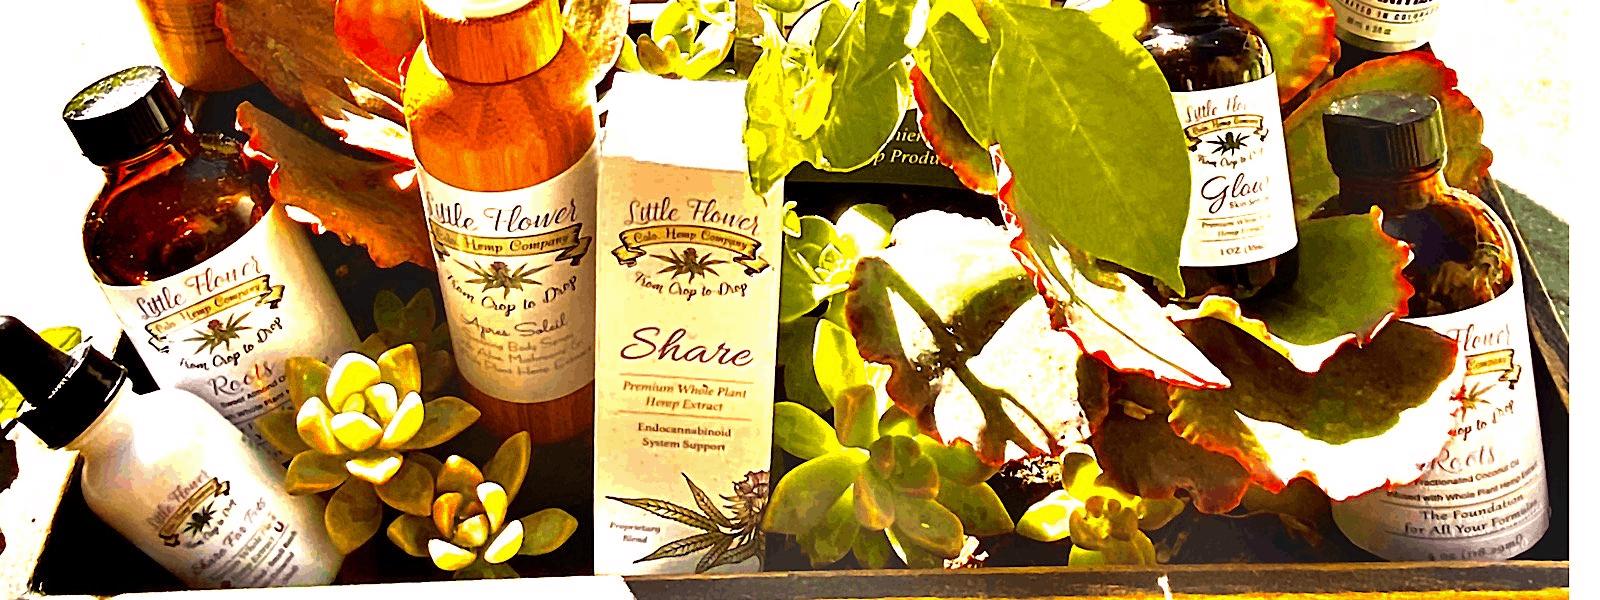 Little Flower Hemp Company CBD Coupons Products